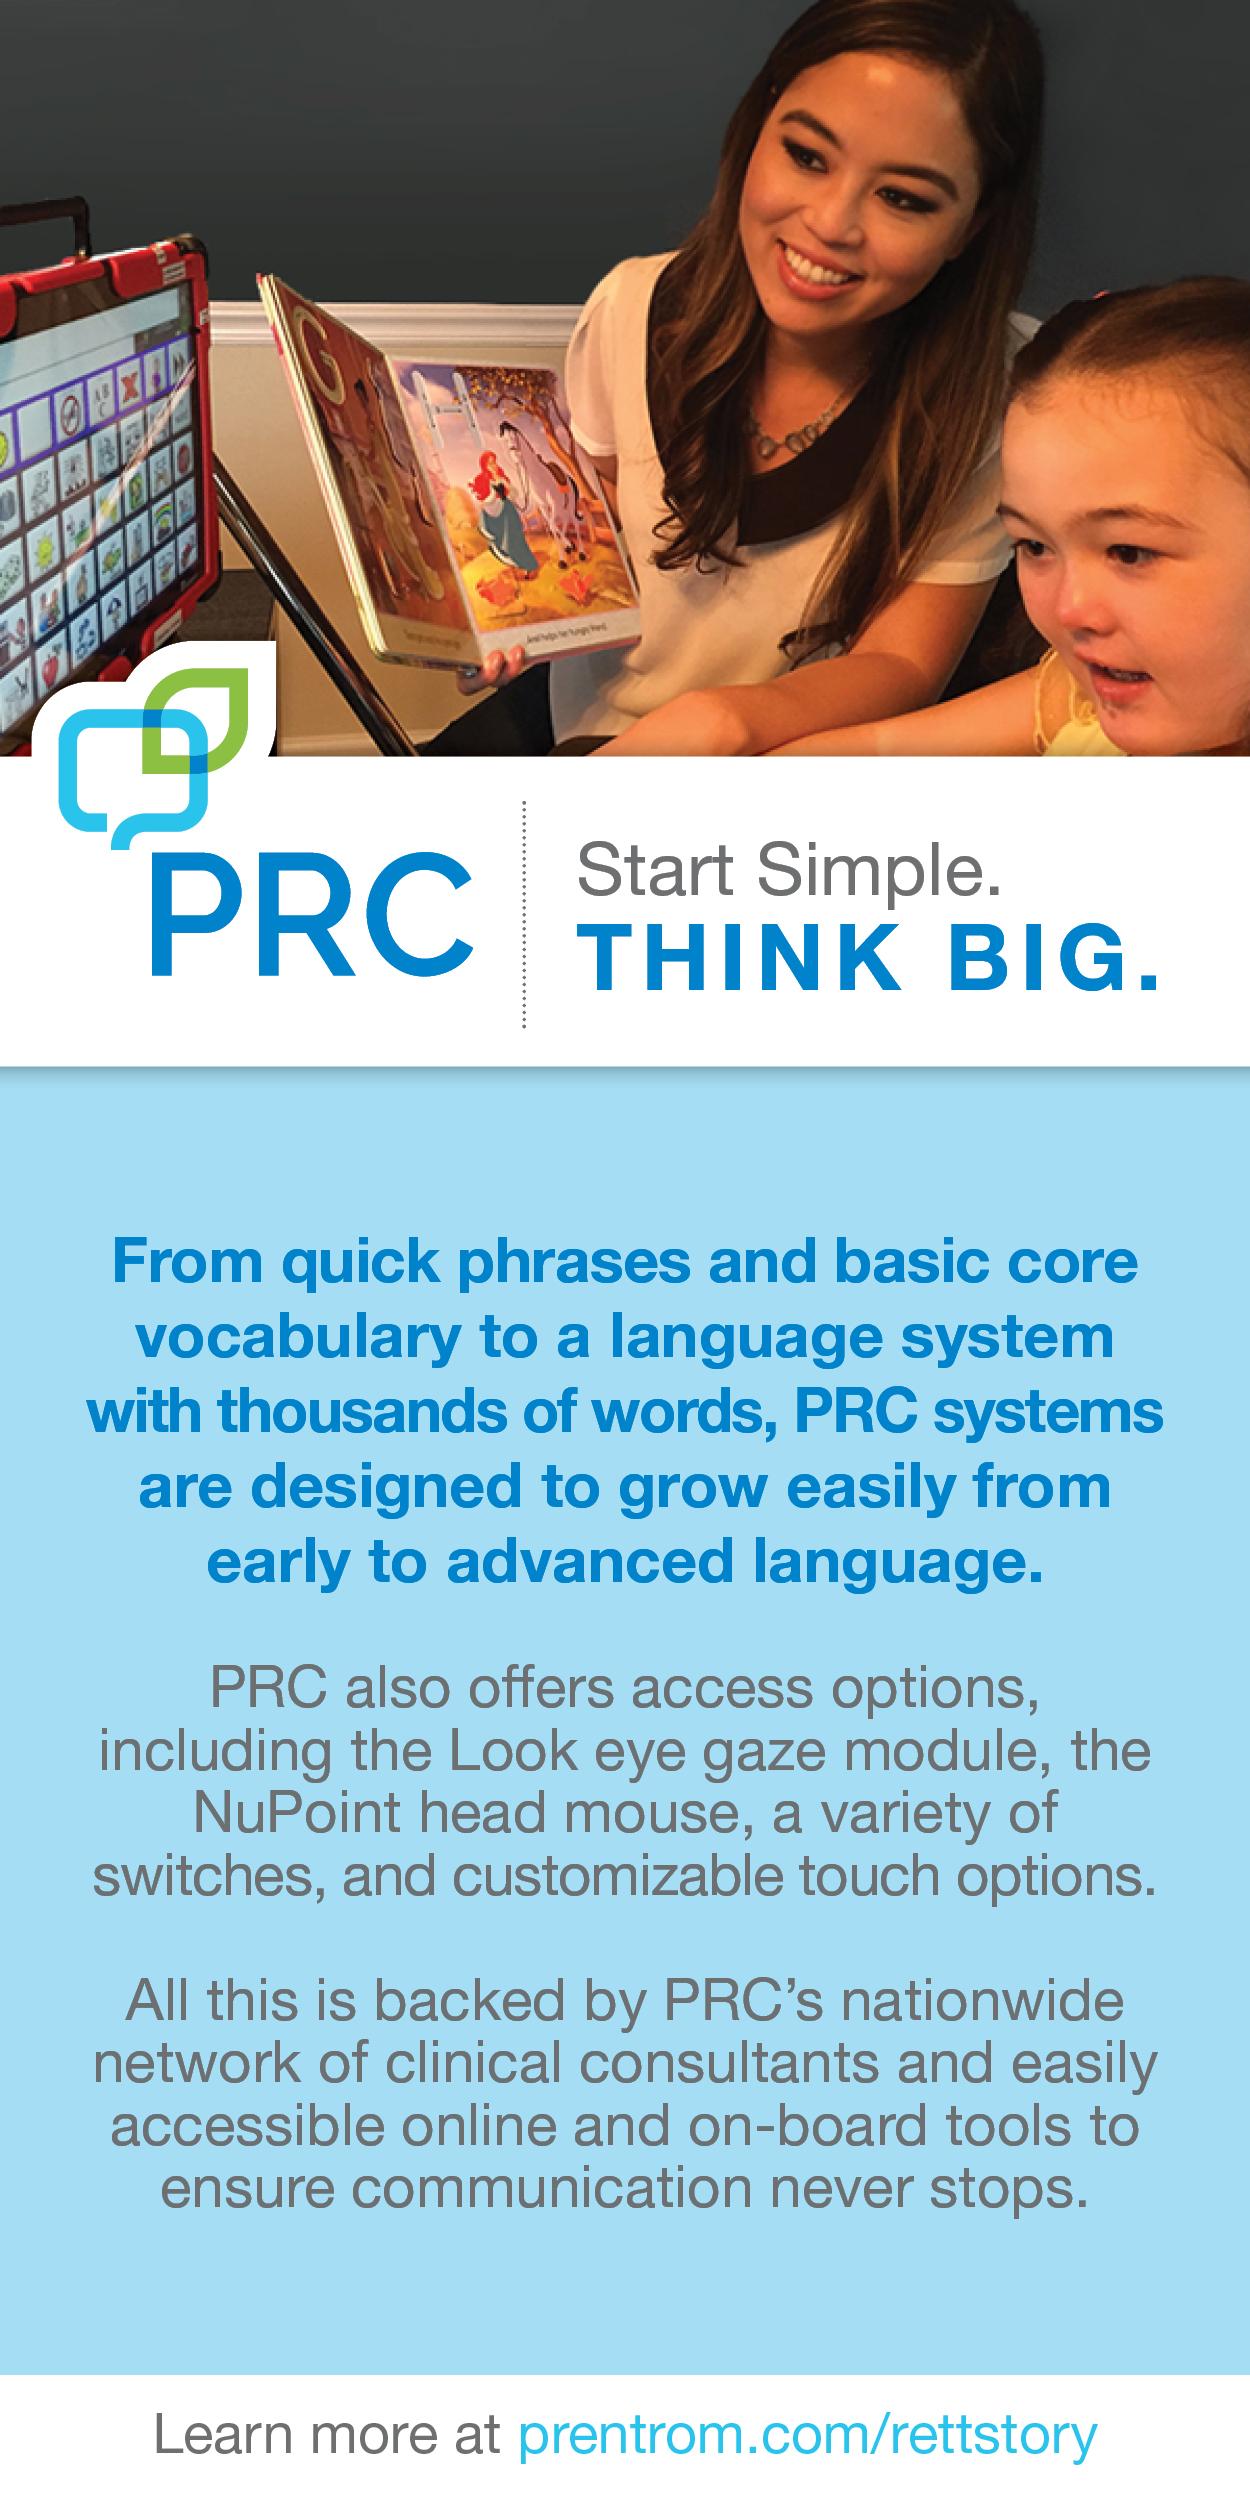 PRC Start Simple. THINK BIG.